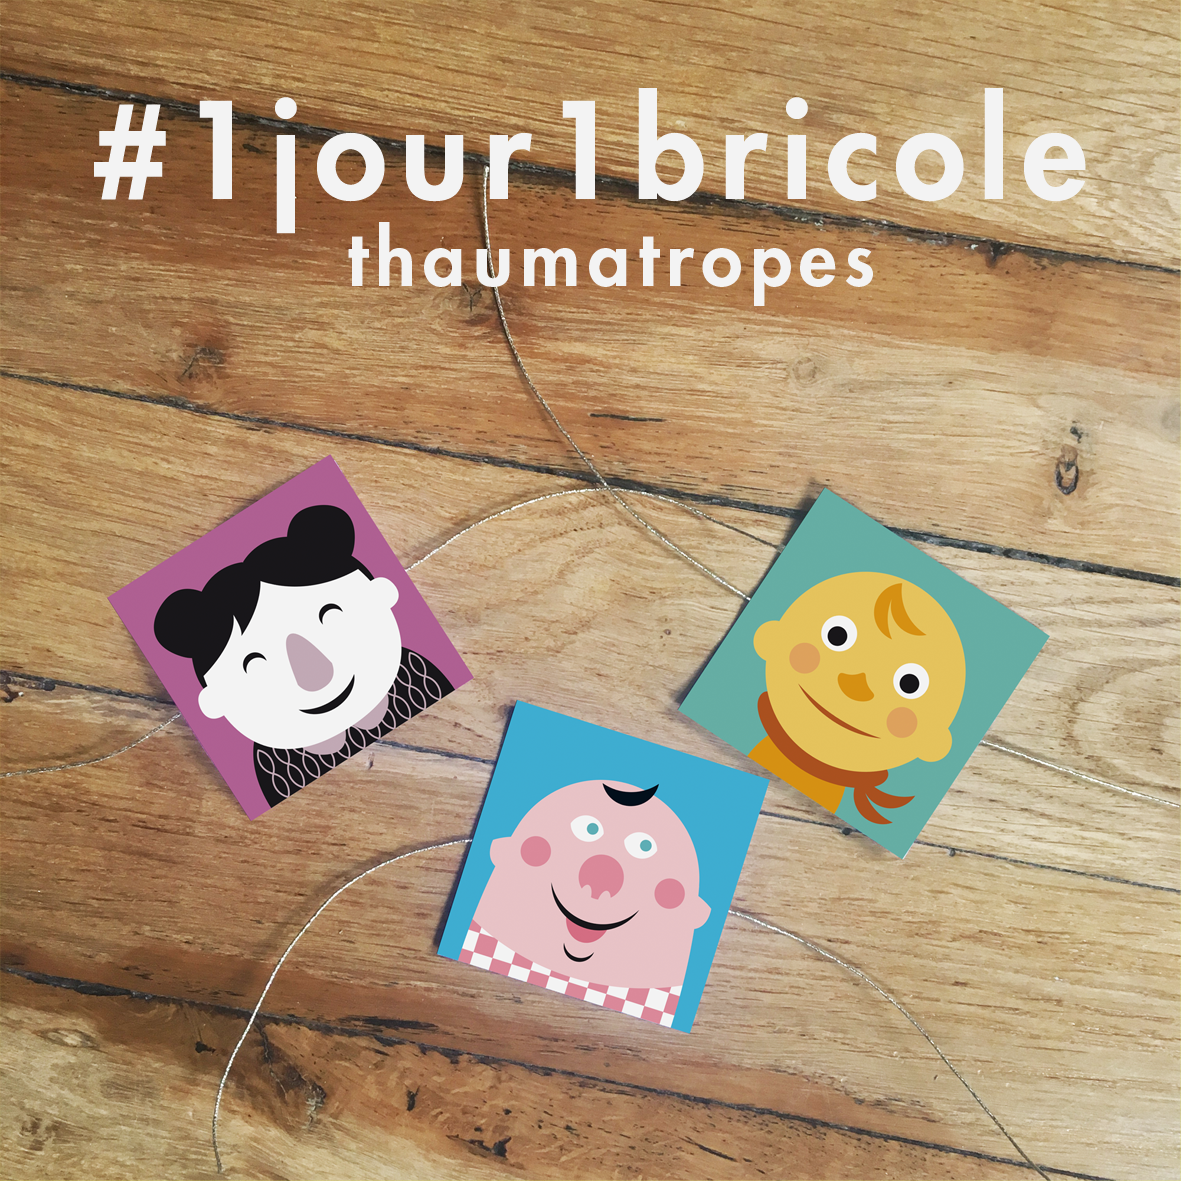 1jour1bricole J22-Taumatropes